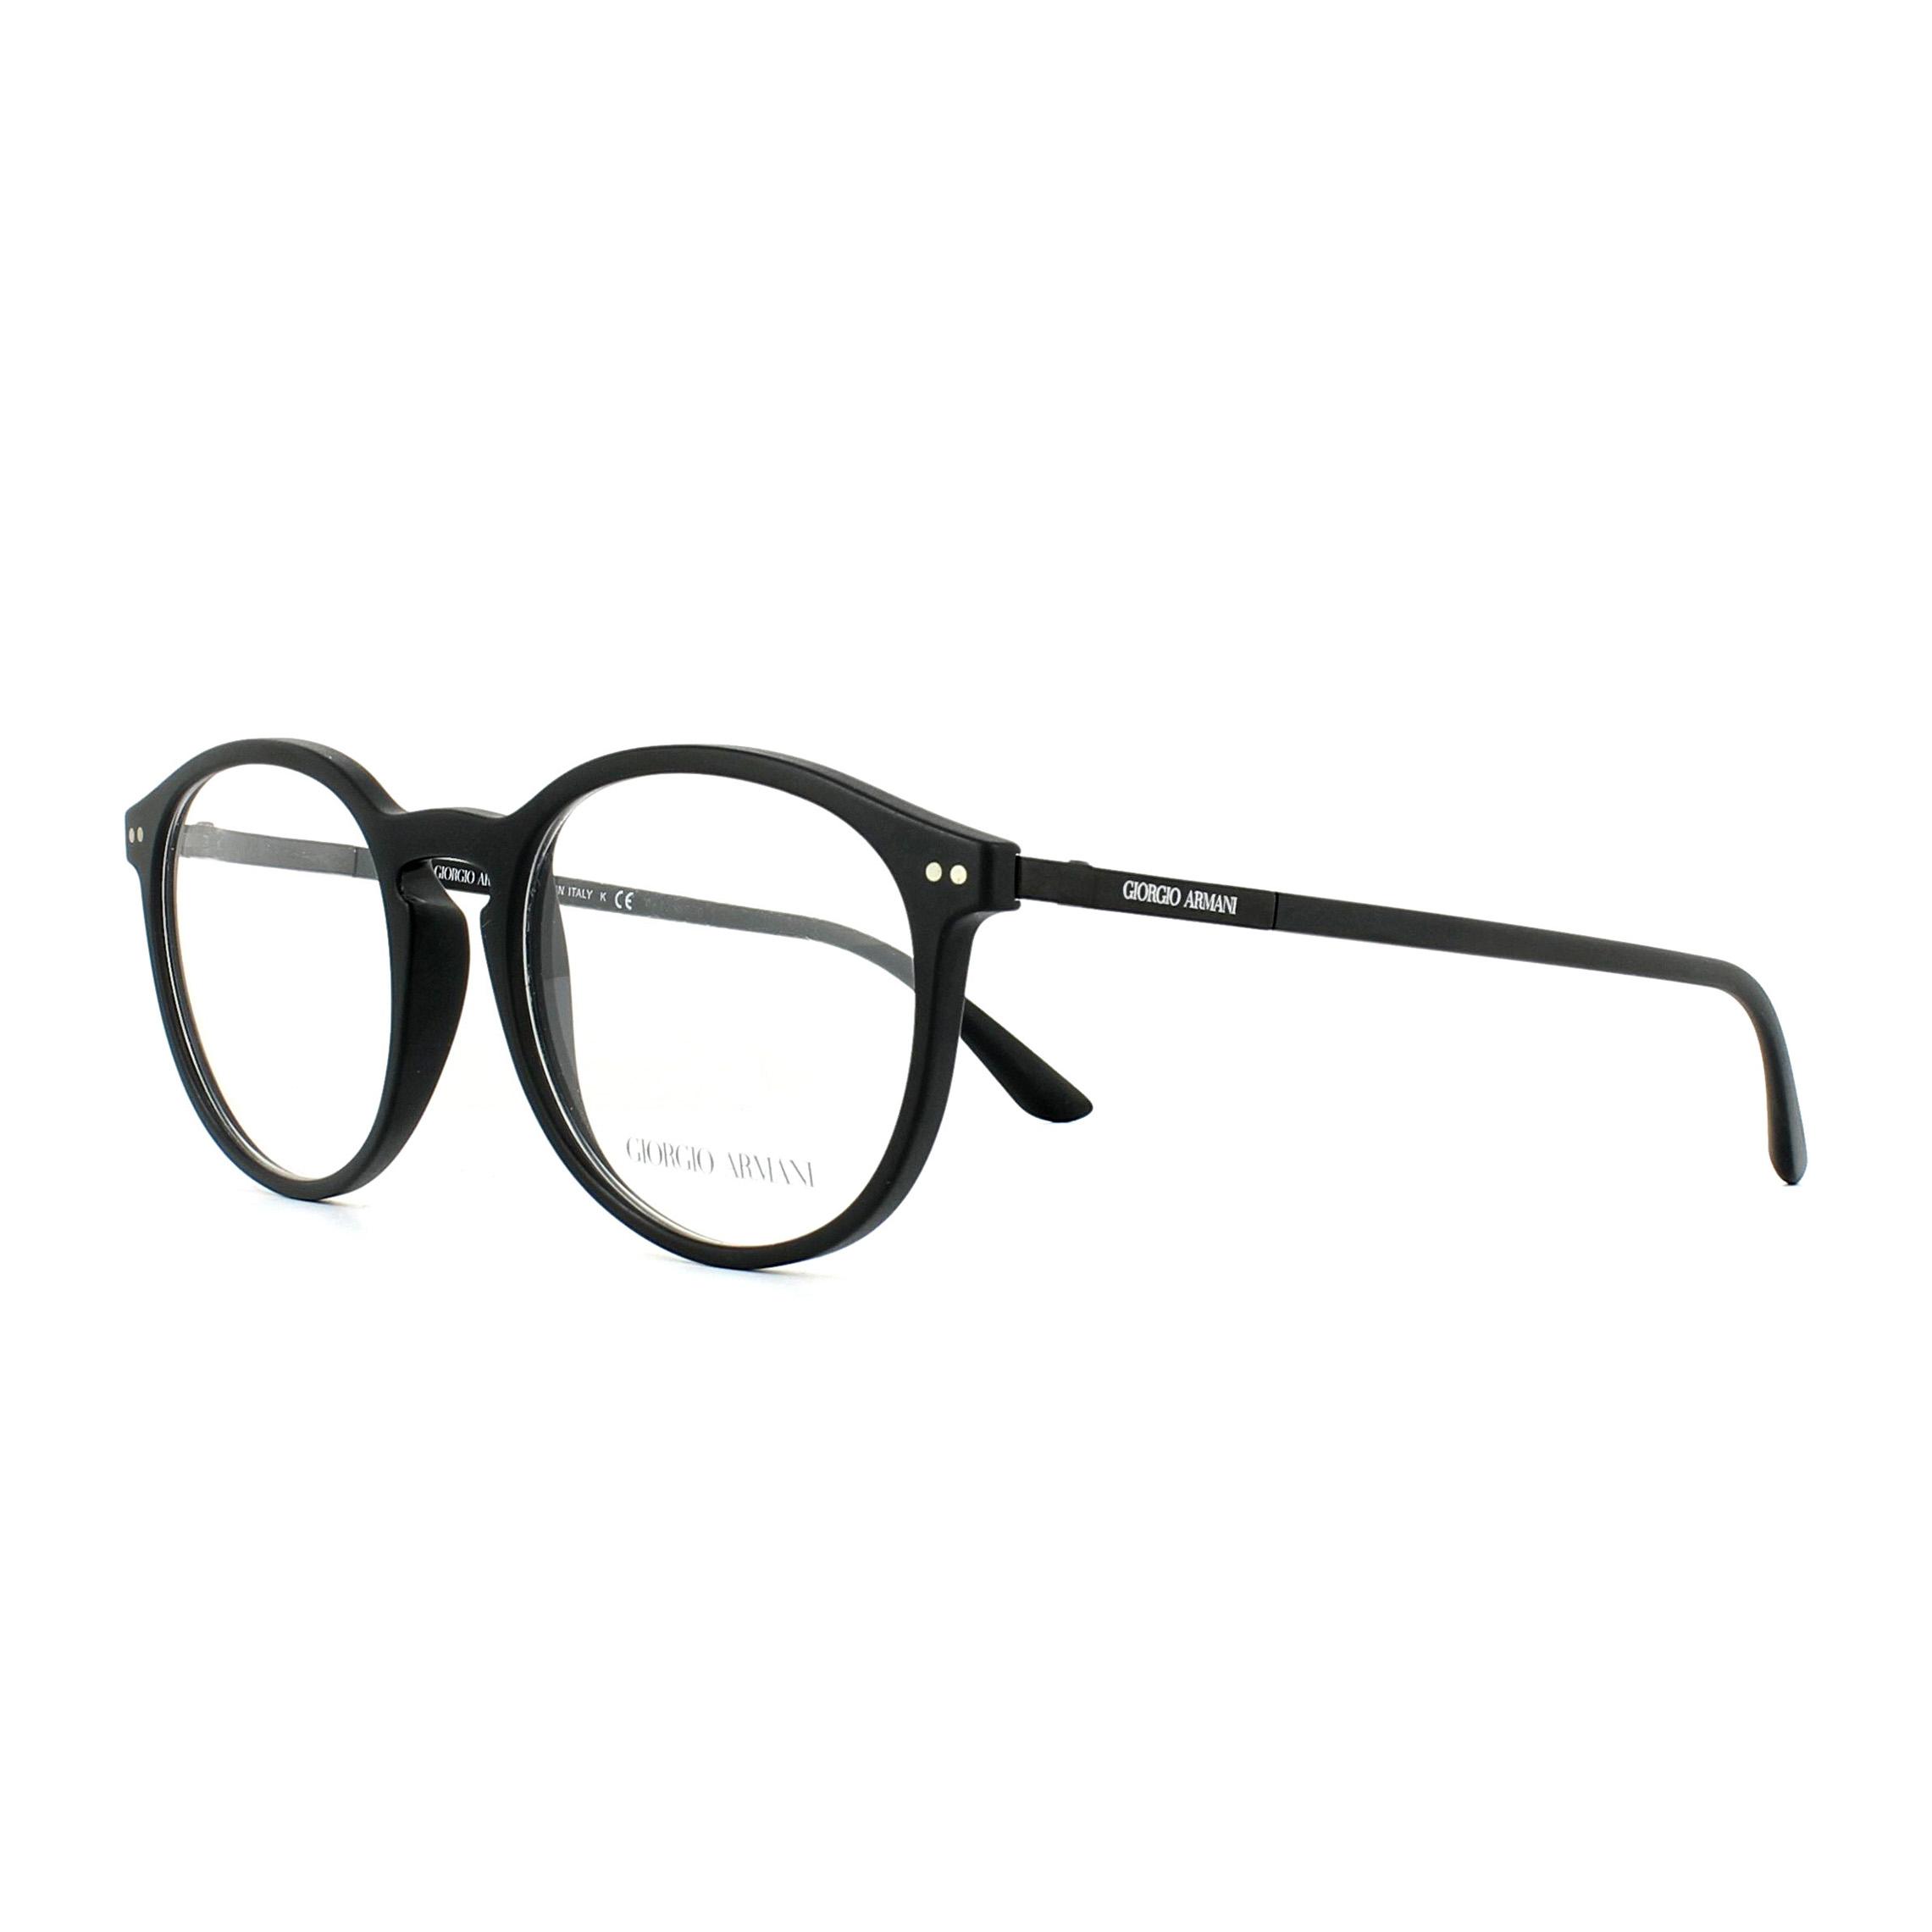 f22d3bd68b3 Sentinel Giorgio Armani Glasses Frames AR7121 5042 Matte Black 50mm Mens